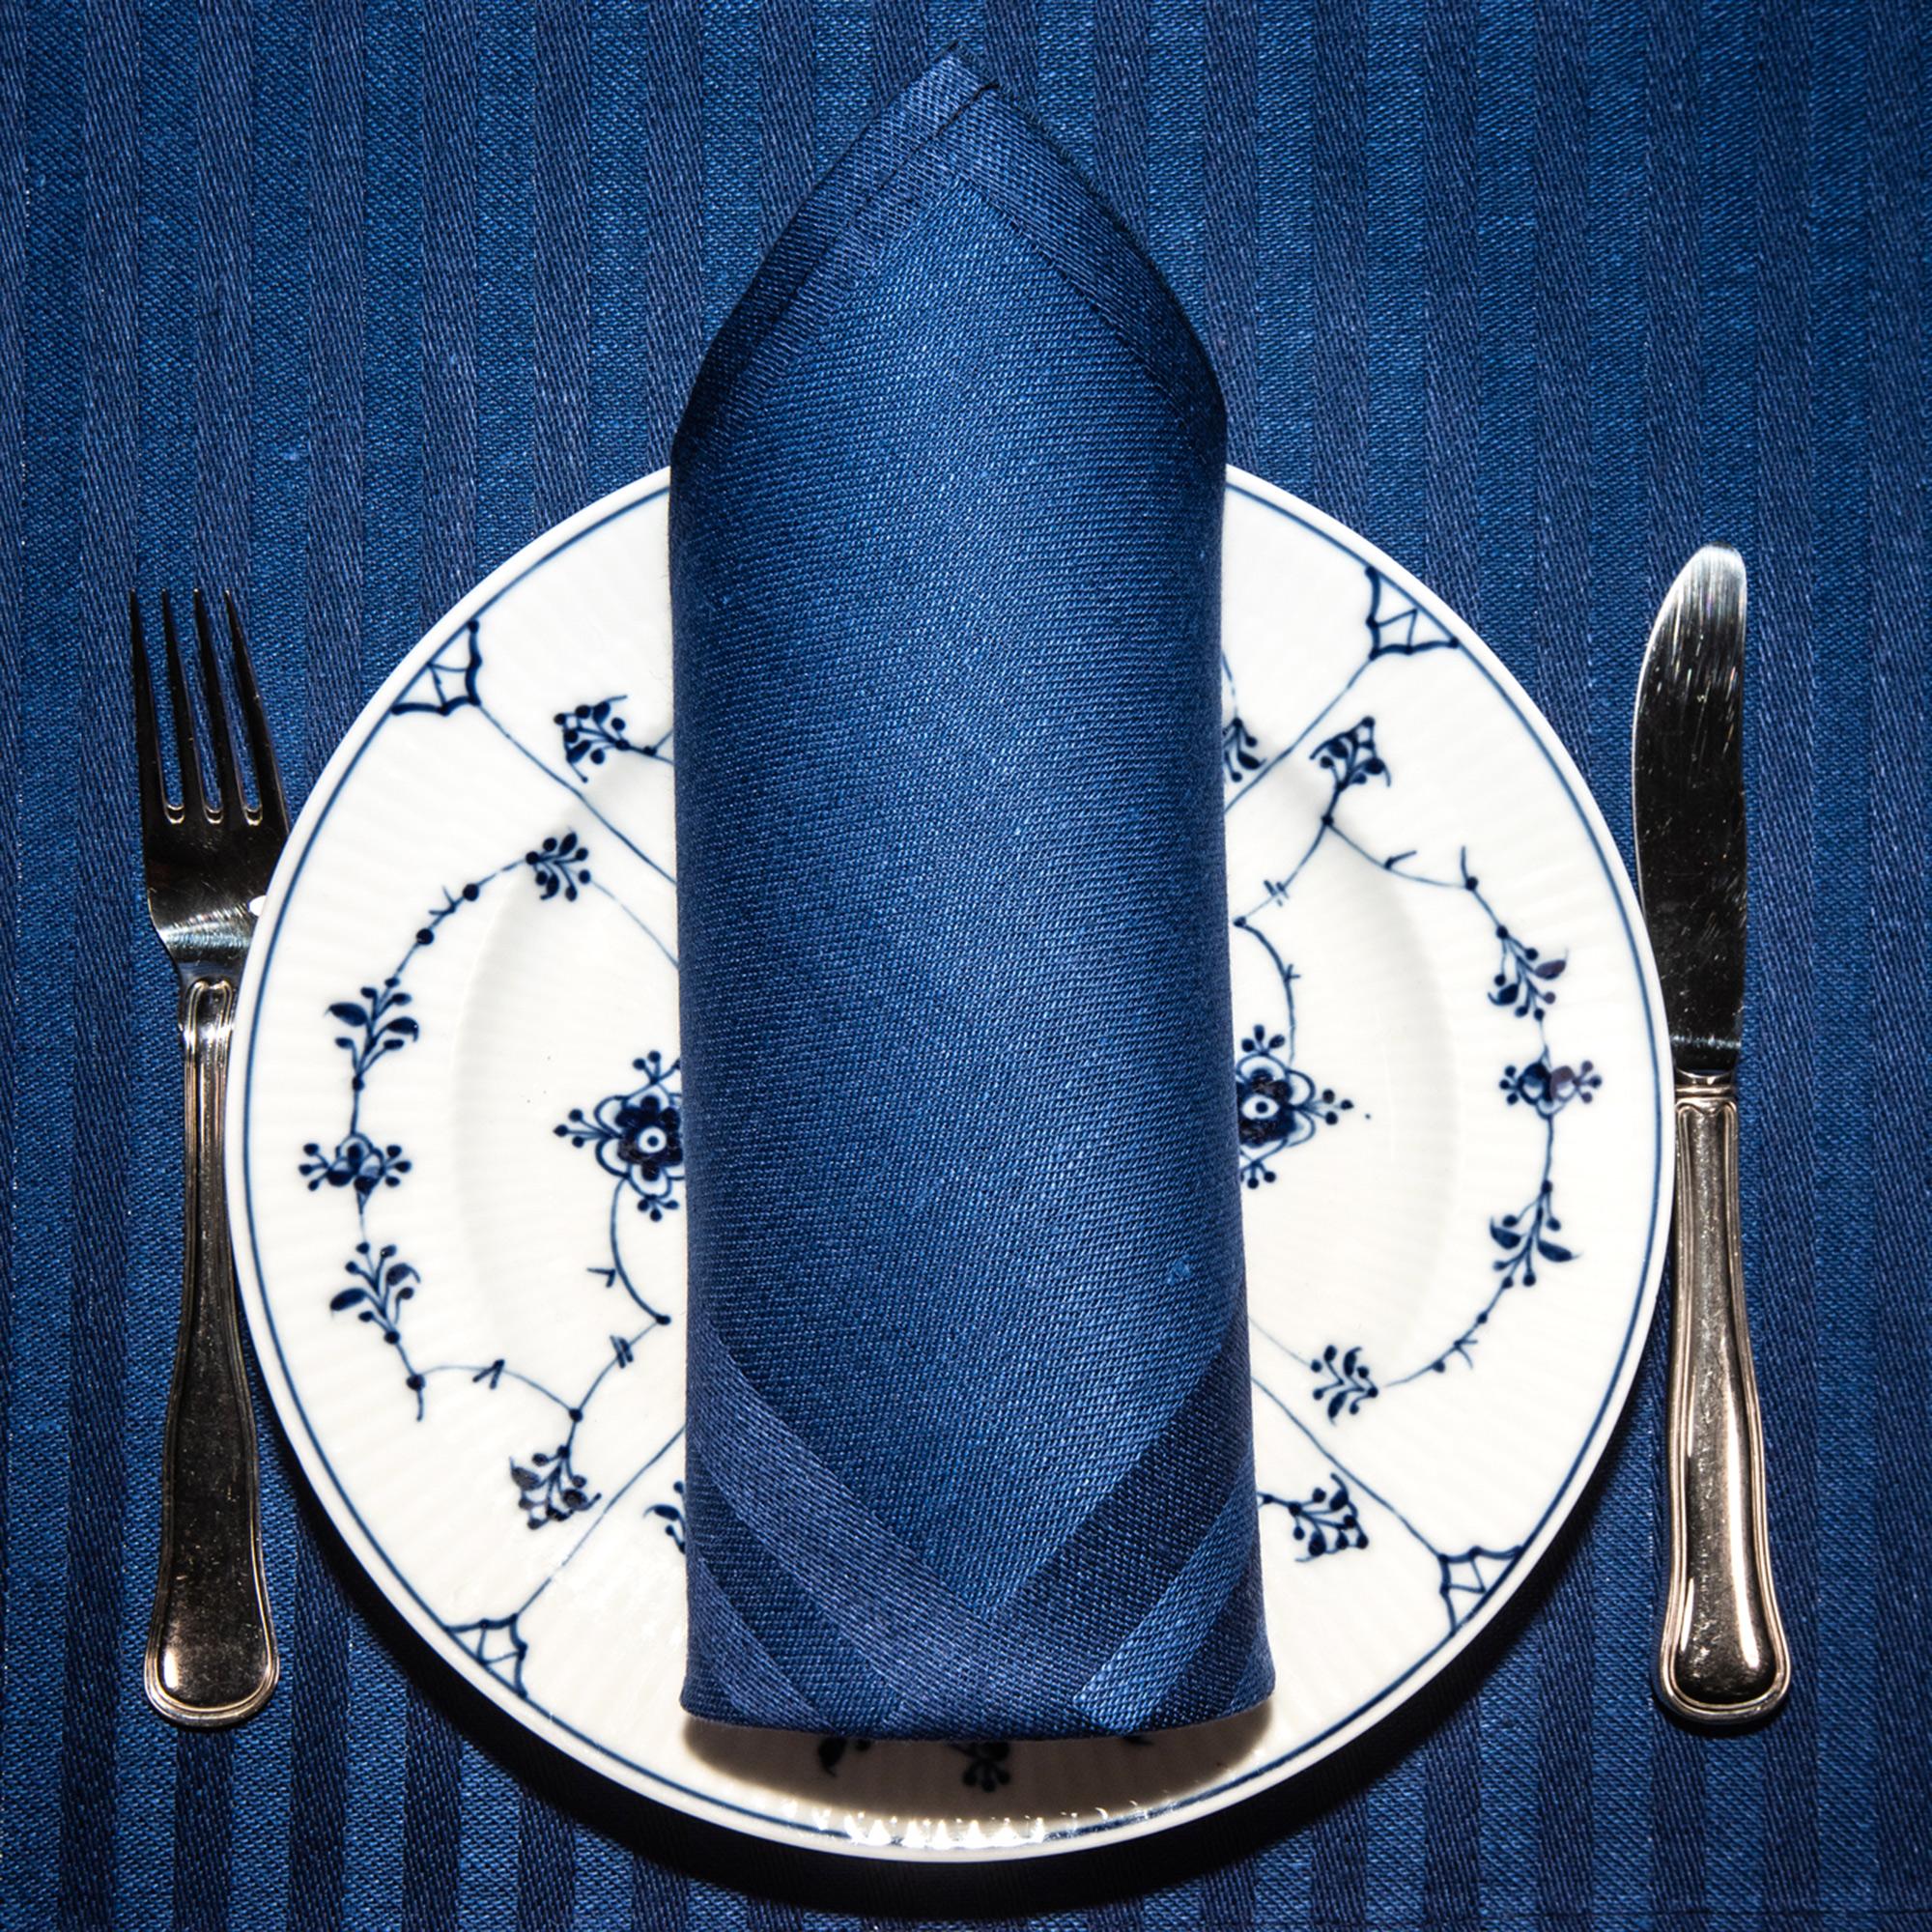 Blå ordern linne servetter tabletter Klässbols Linneväveri Hanne Vedel bordsdukning med tallrik